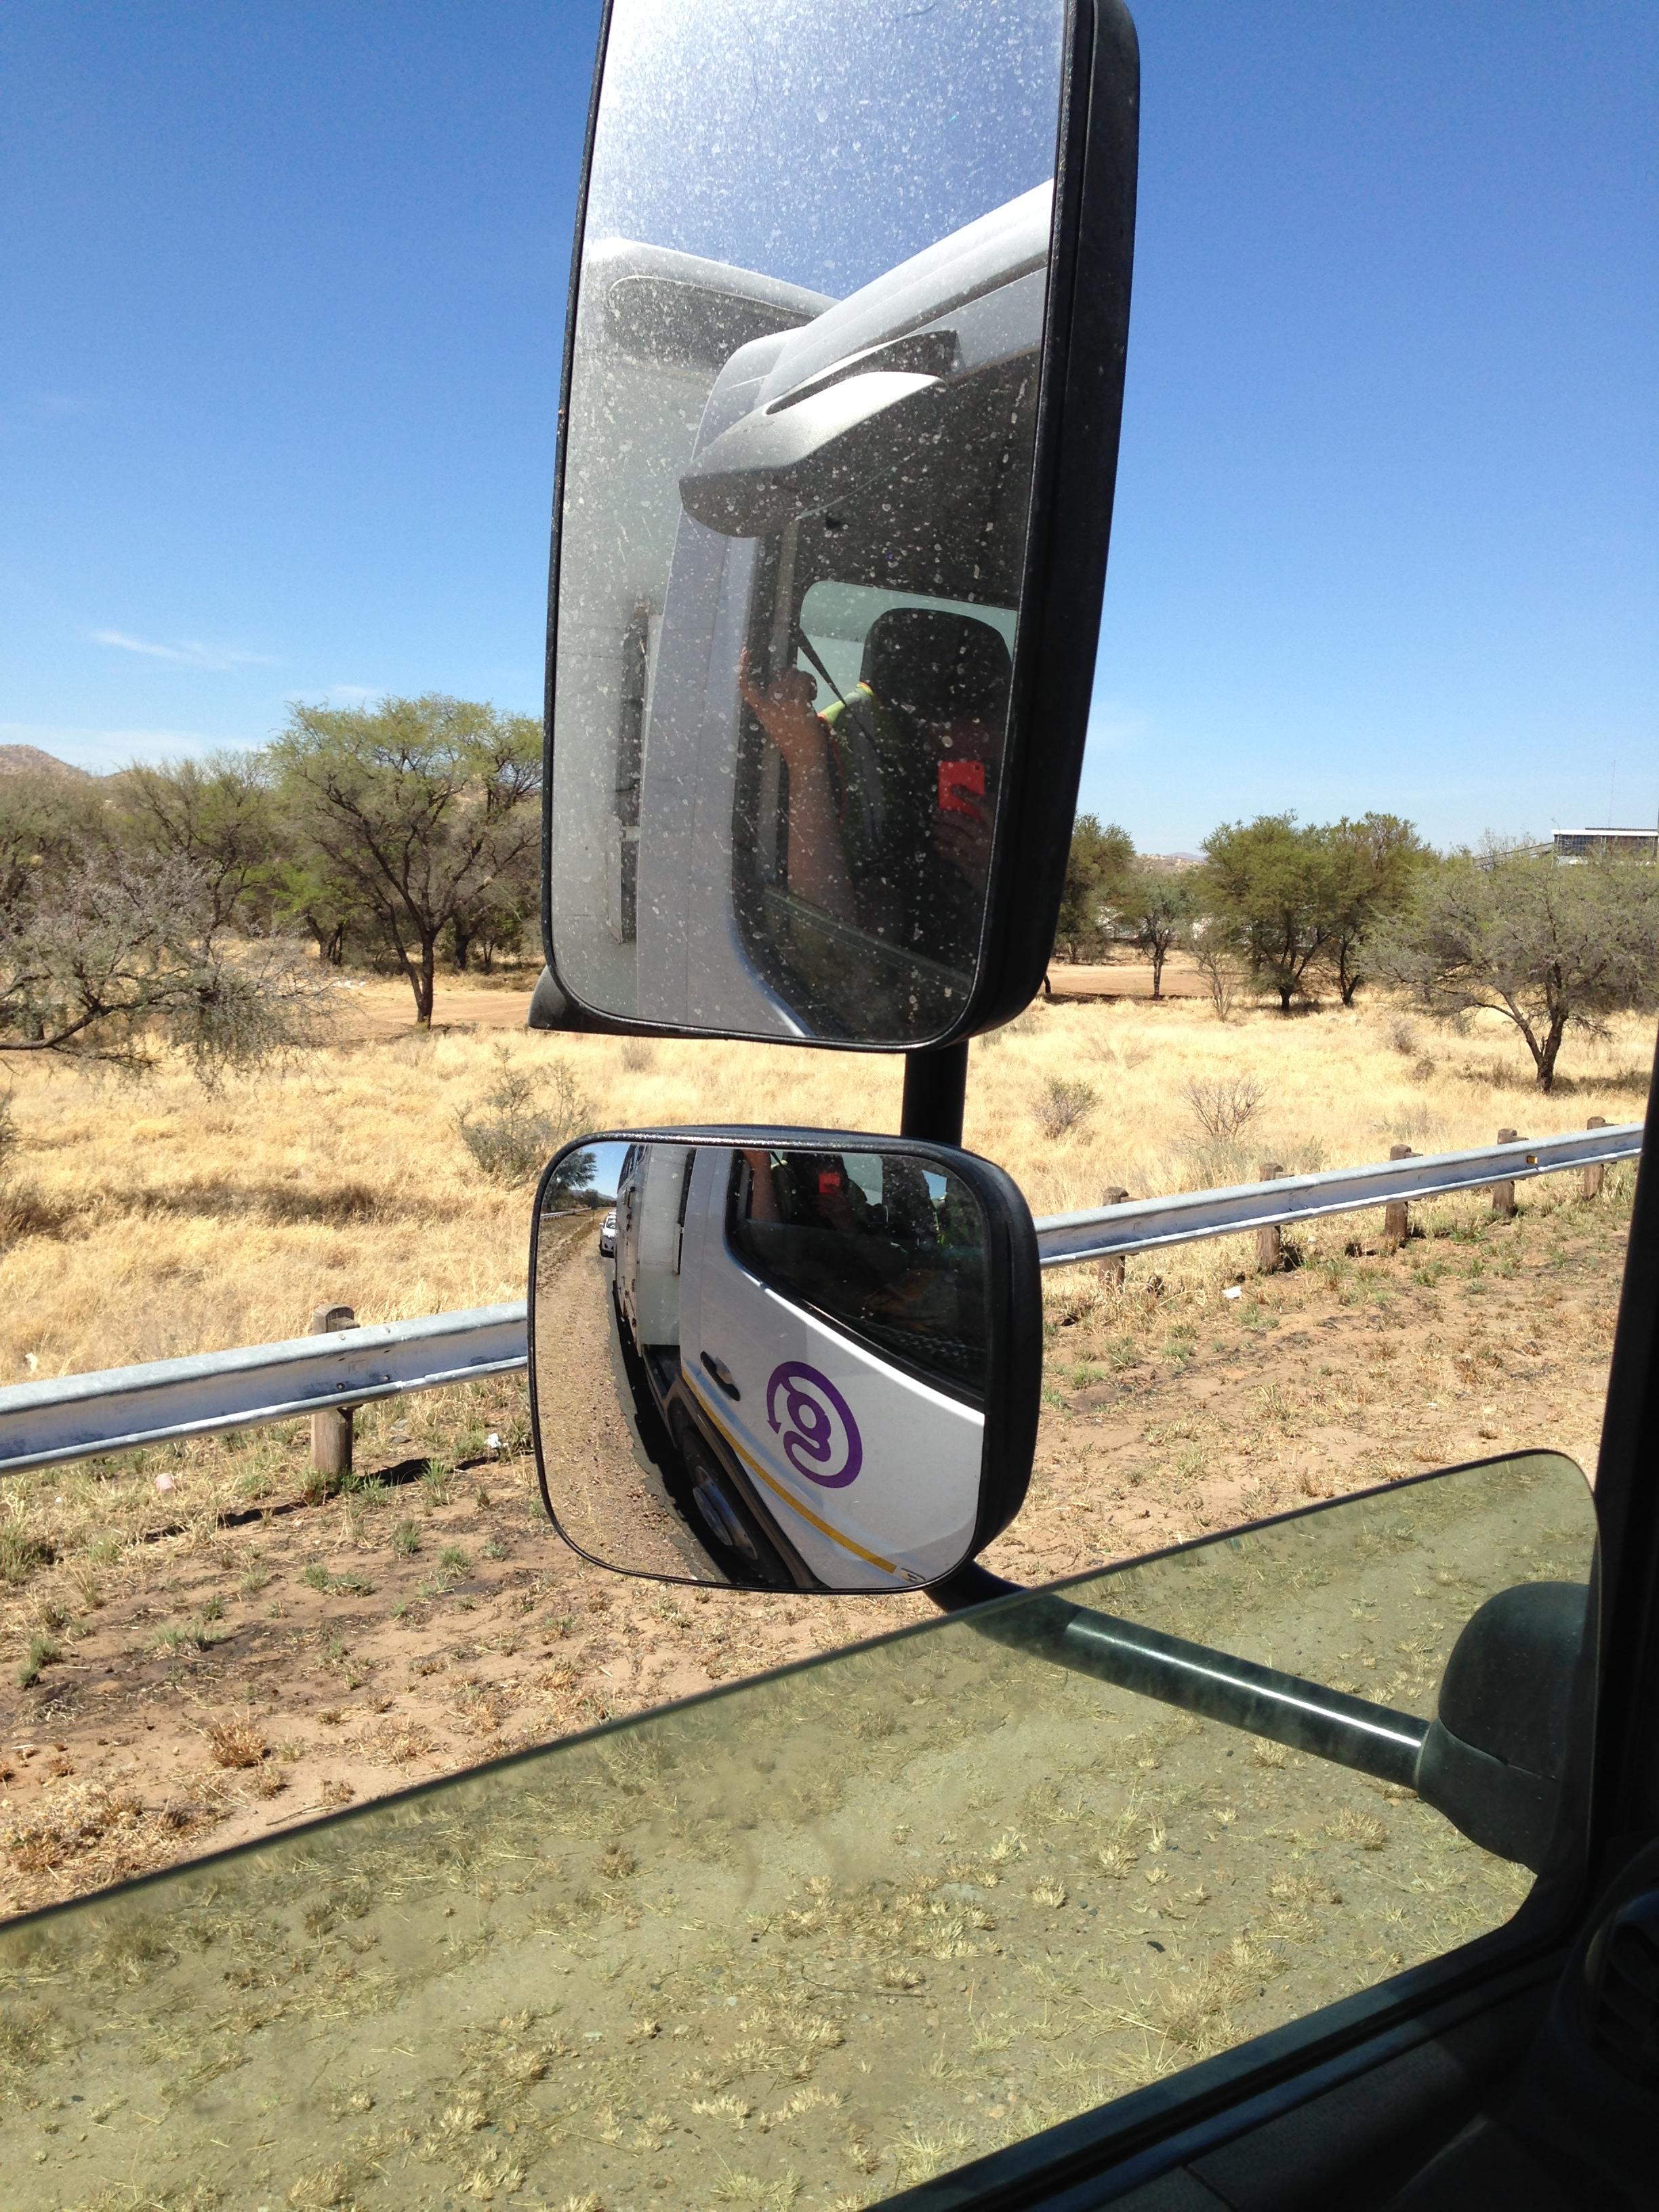 Truck Namibia Windhoek G Adventures